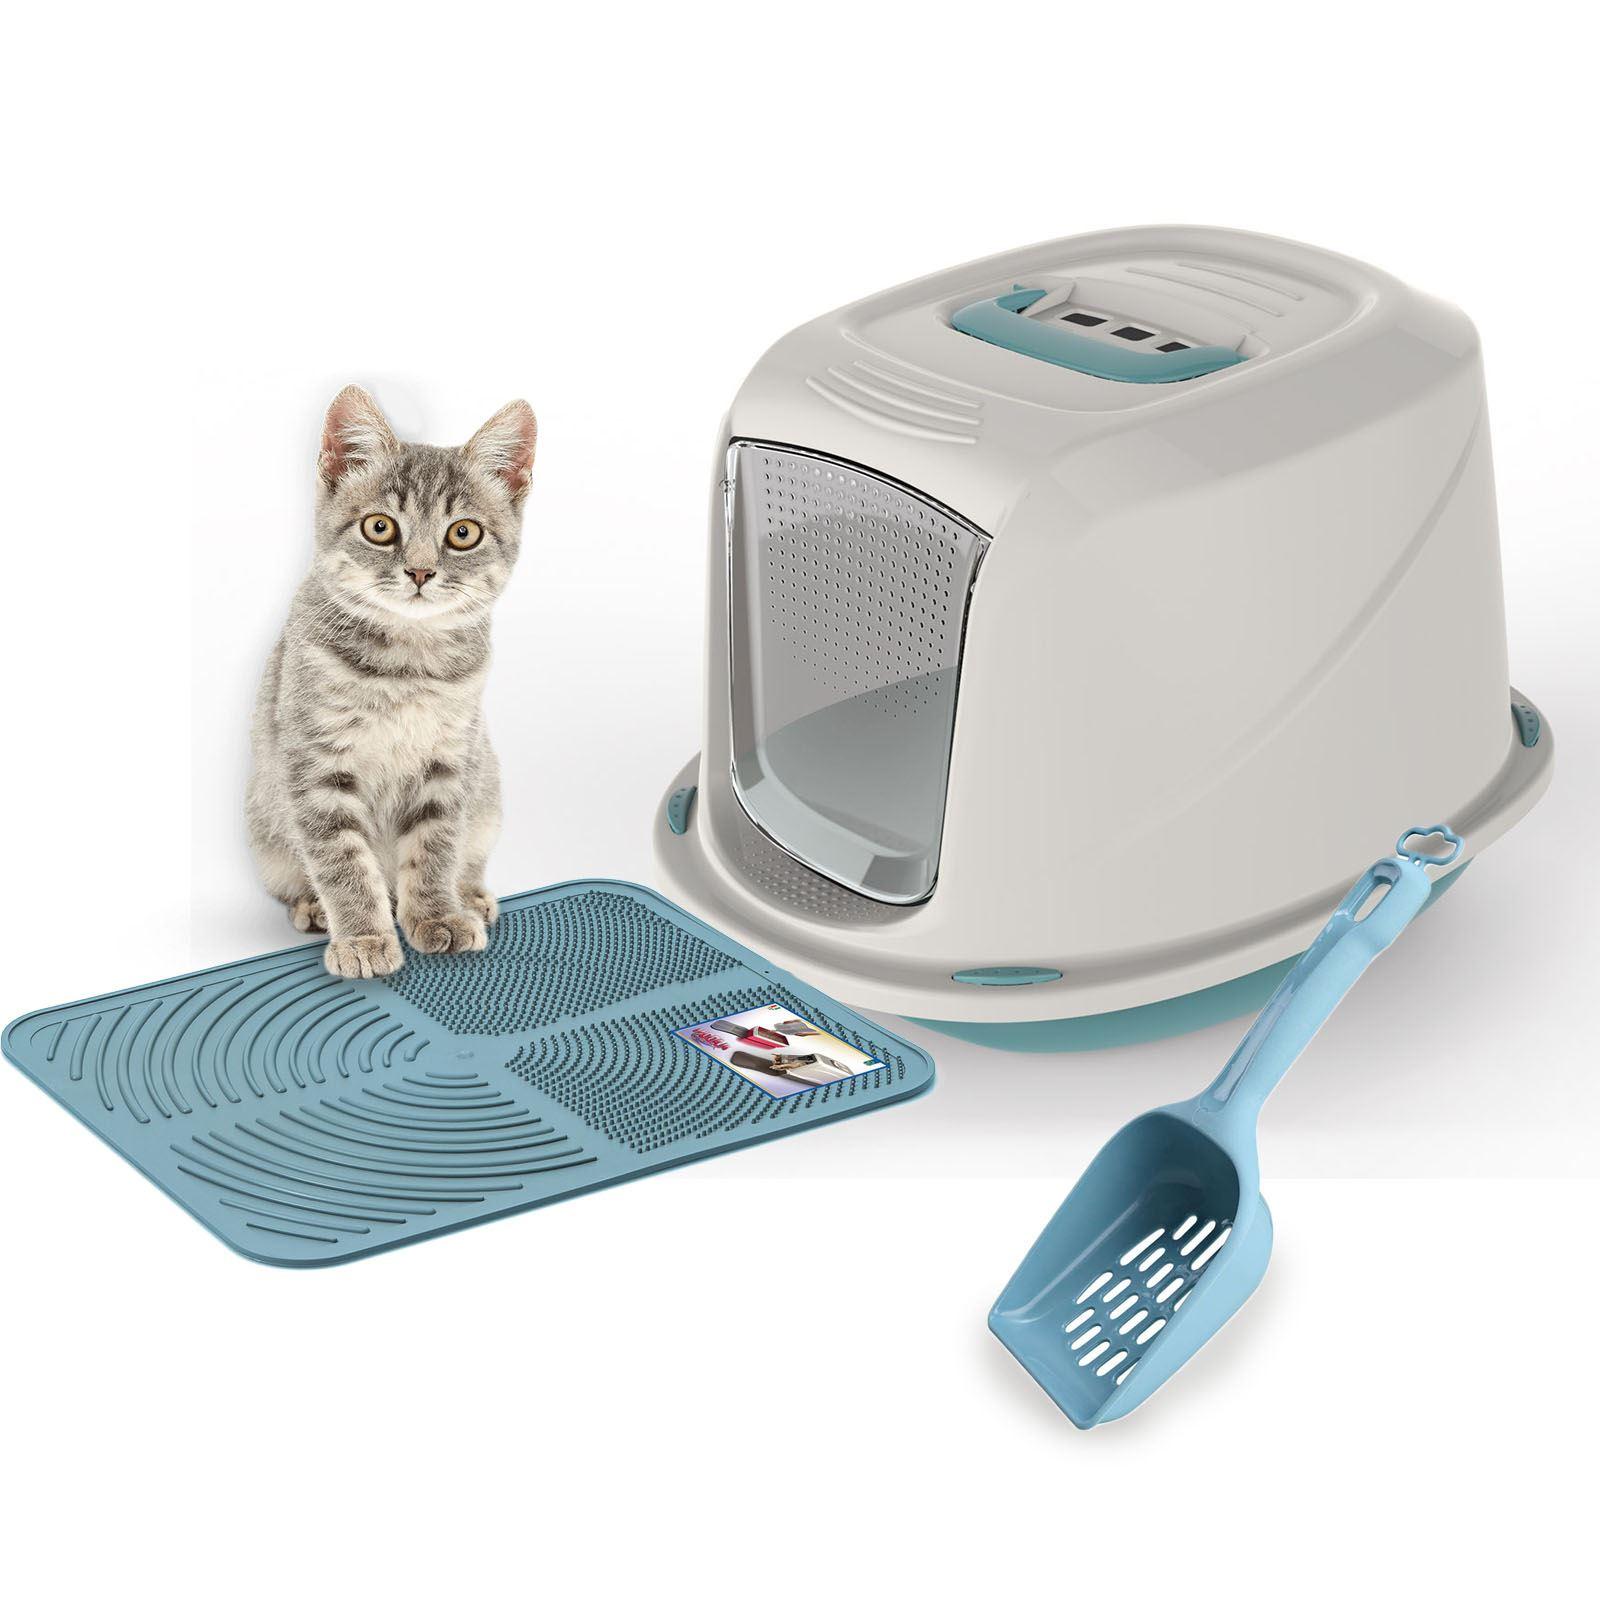 premium hooded kitten cat litter box tray filter scoop. Black Bedroom Furniture Sets. Home Design Ideas